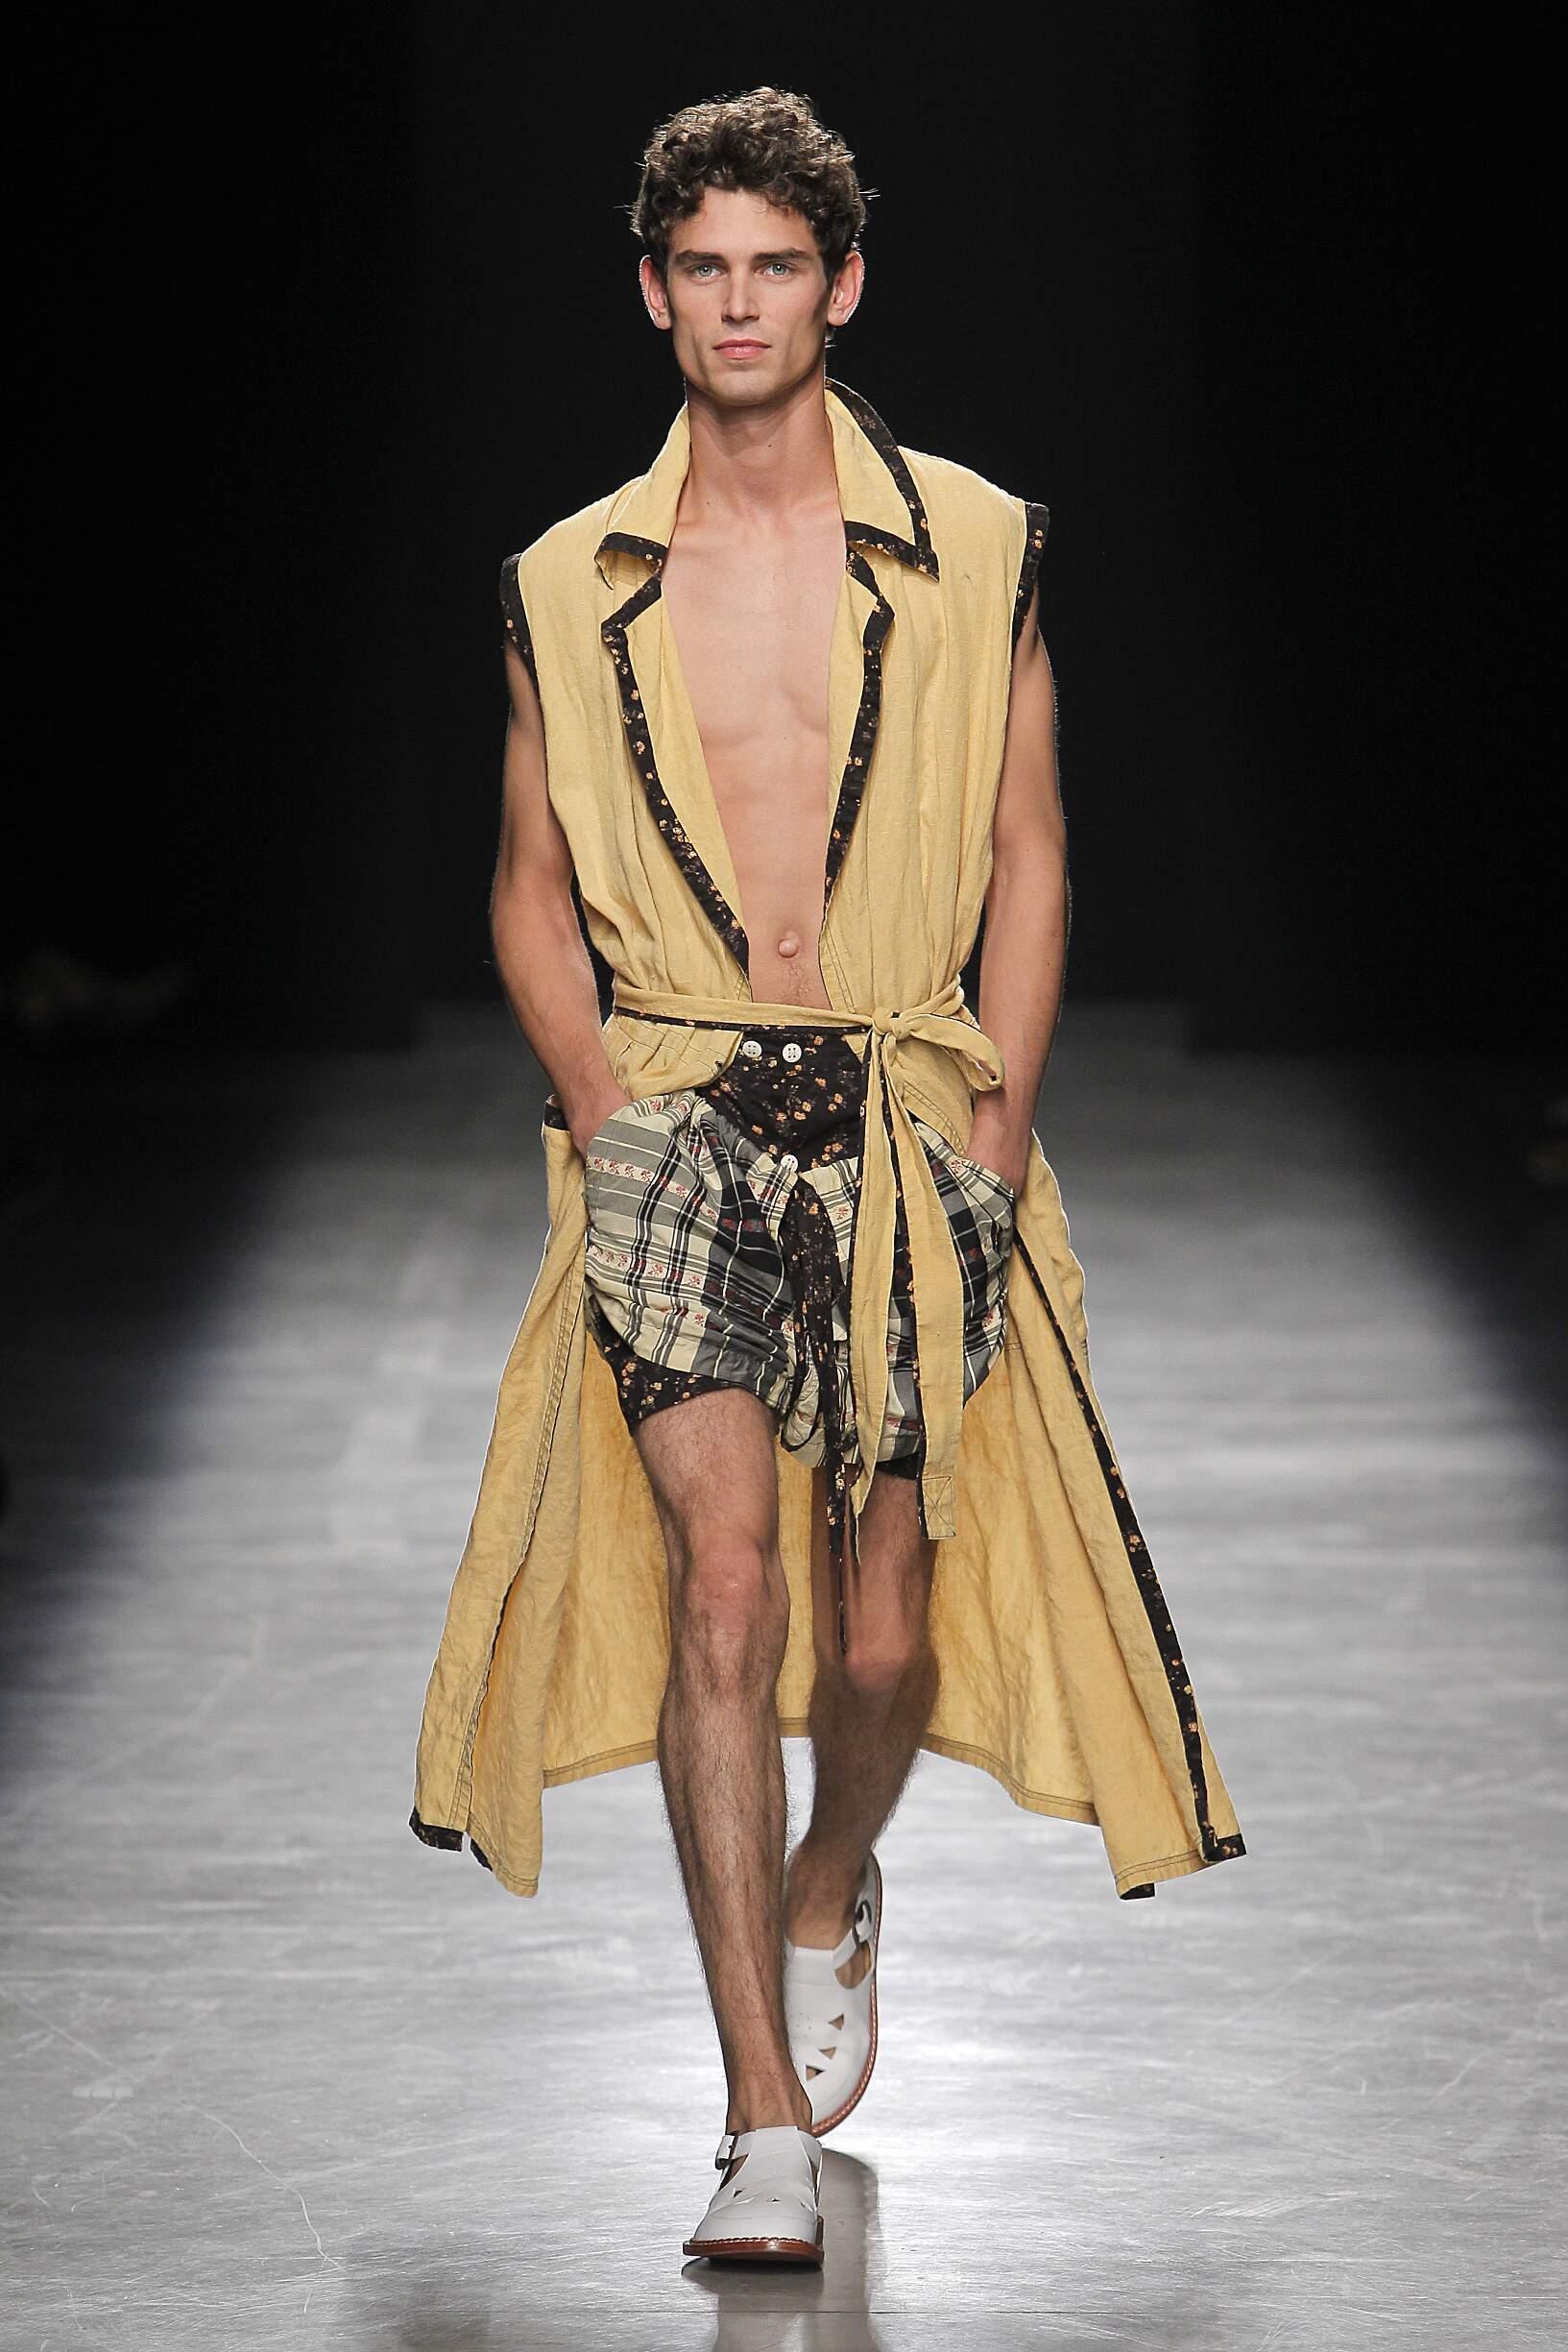 Catwalk Andreas Kronthaler for Vivienne Westwood Man Fashion Show Summer 2017